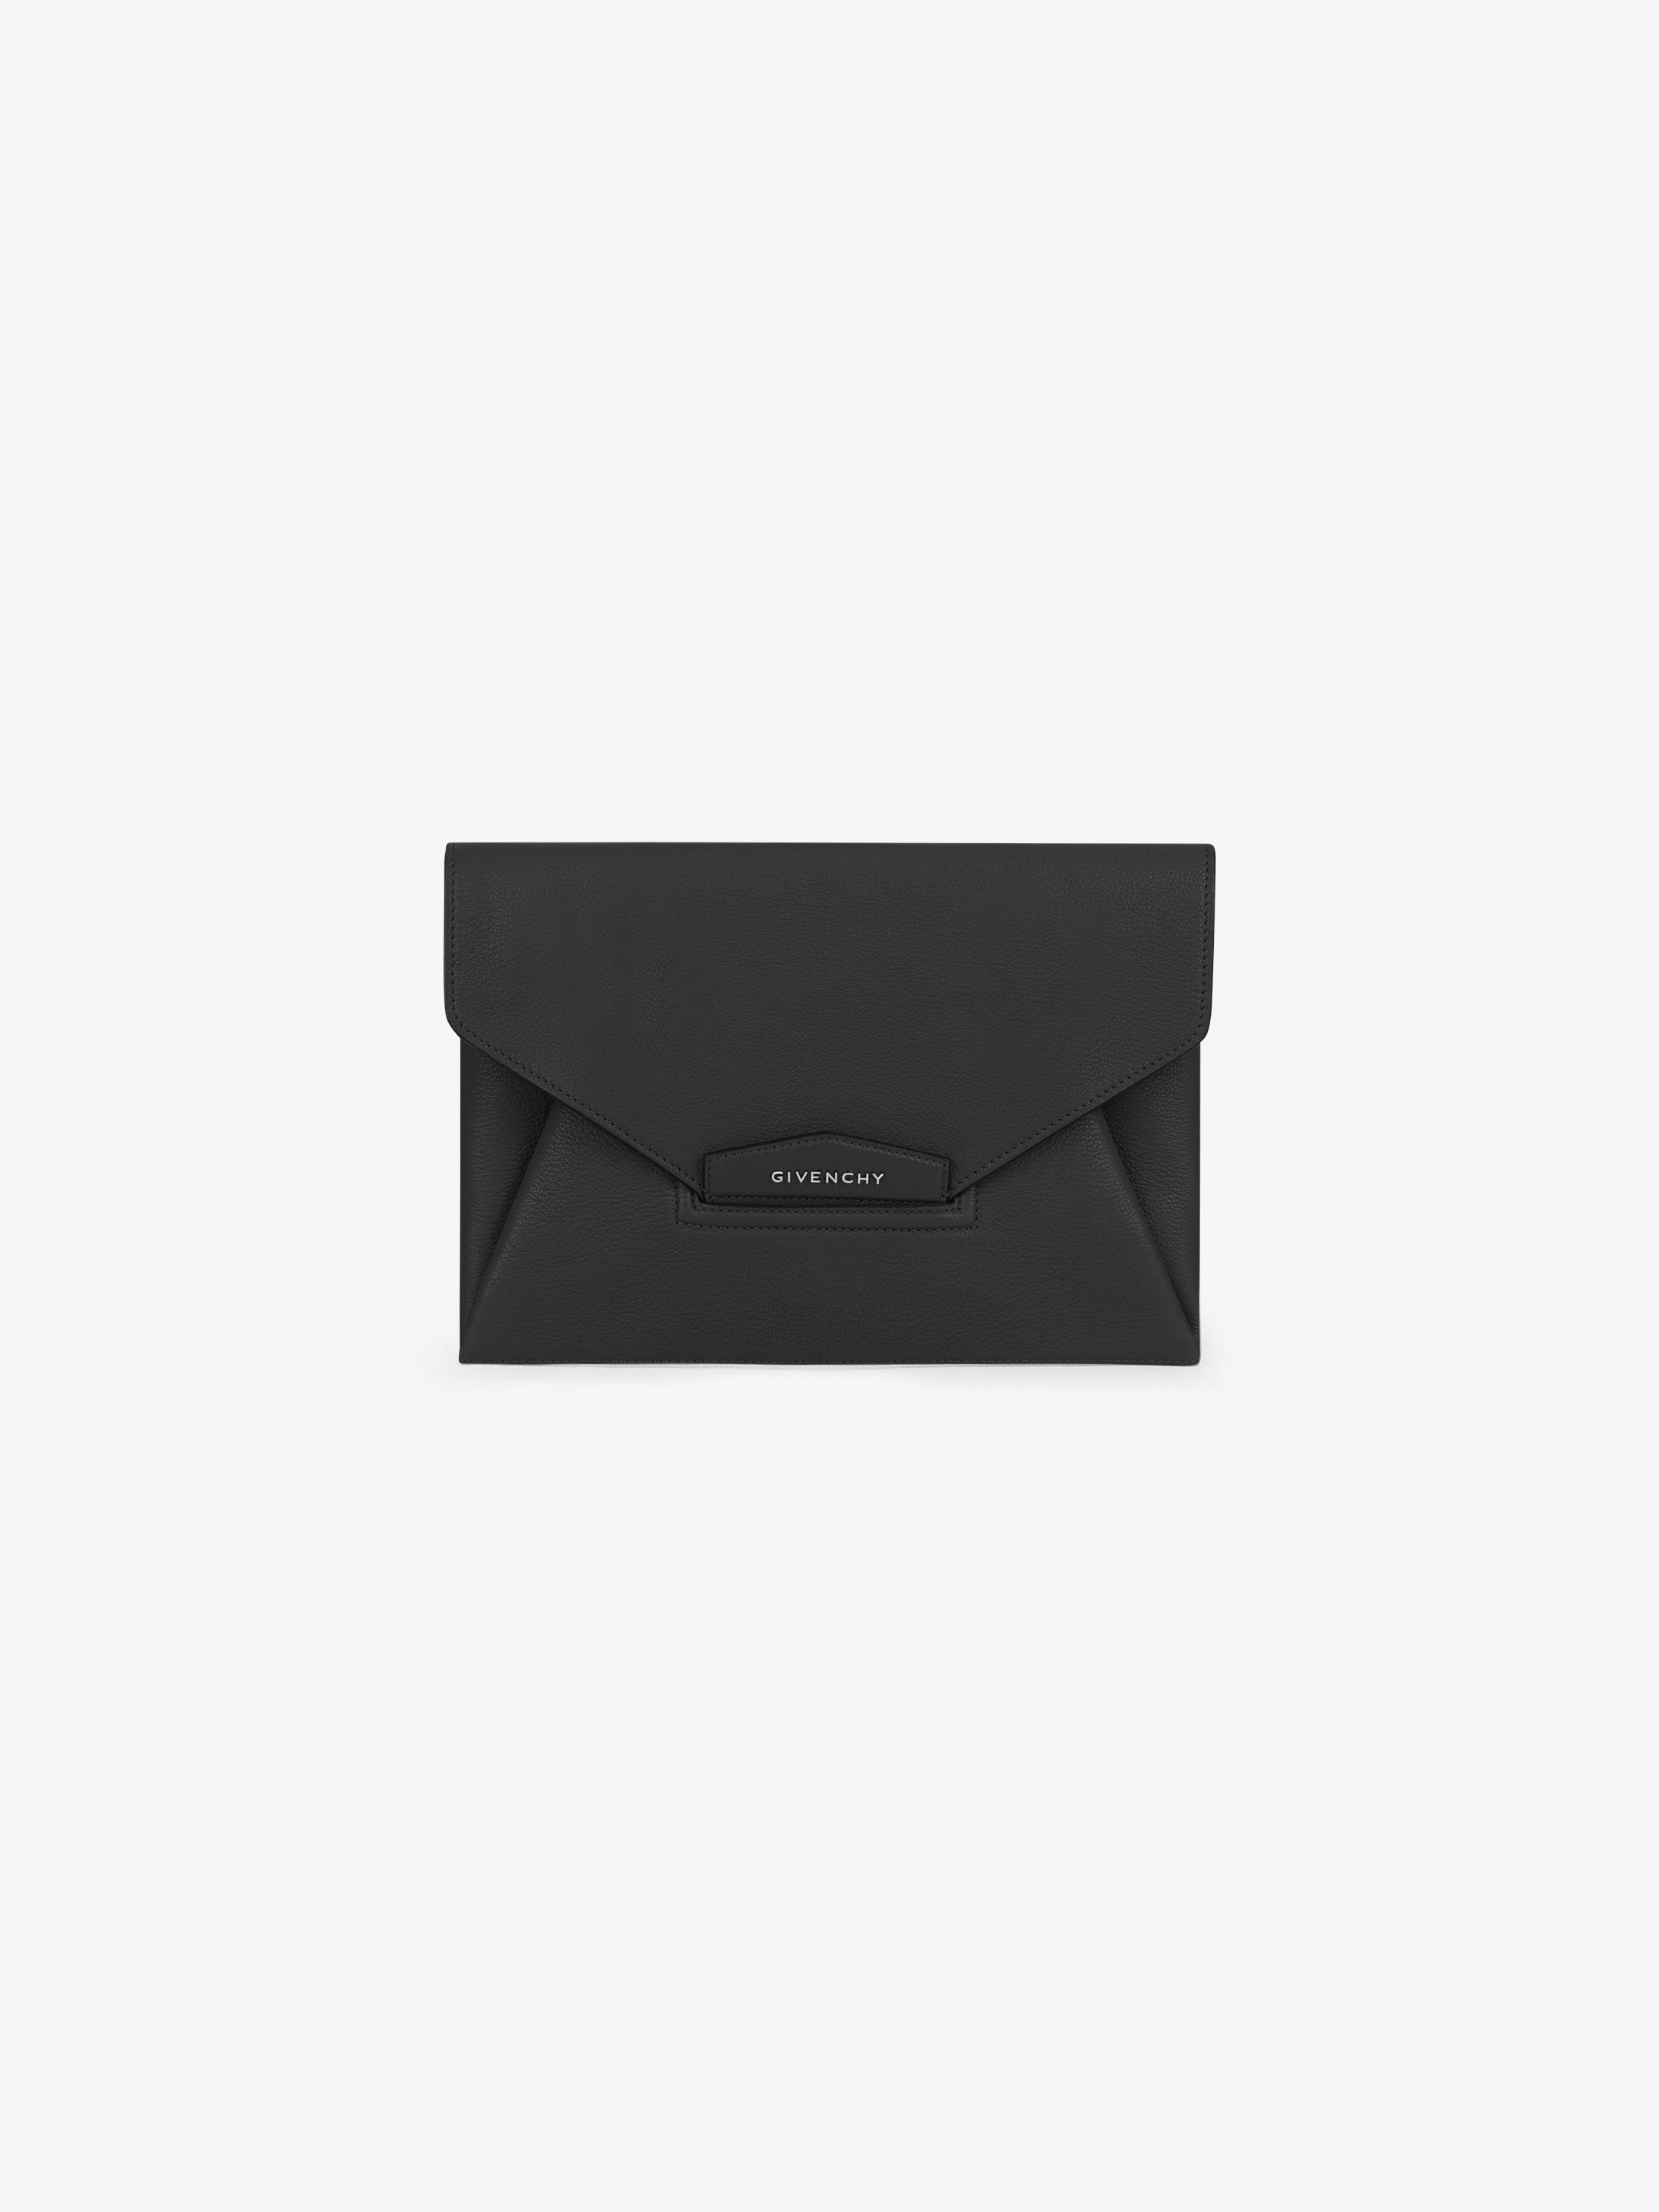 Antigona pouch in leather